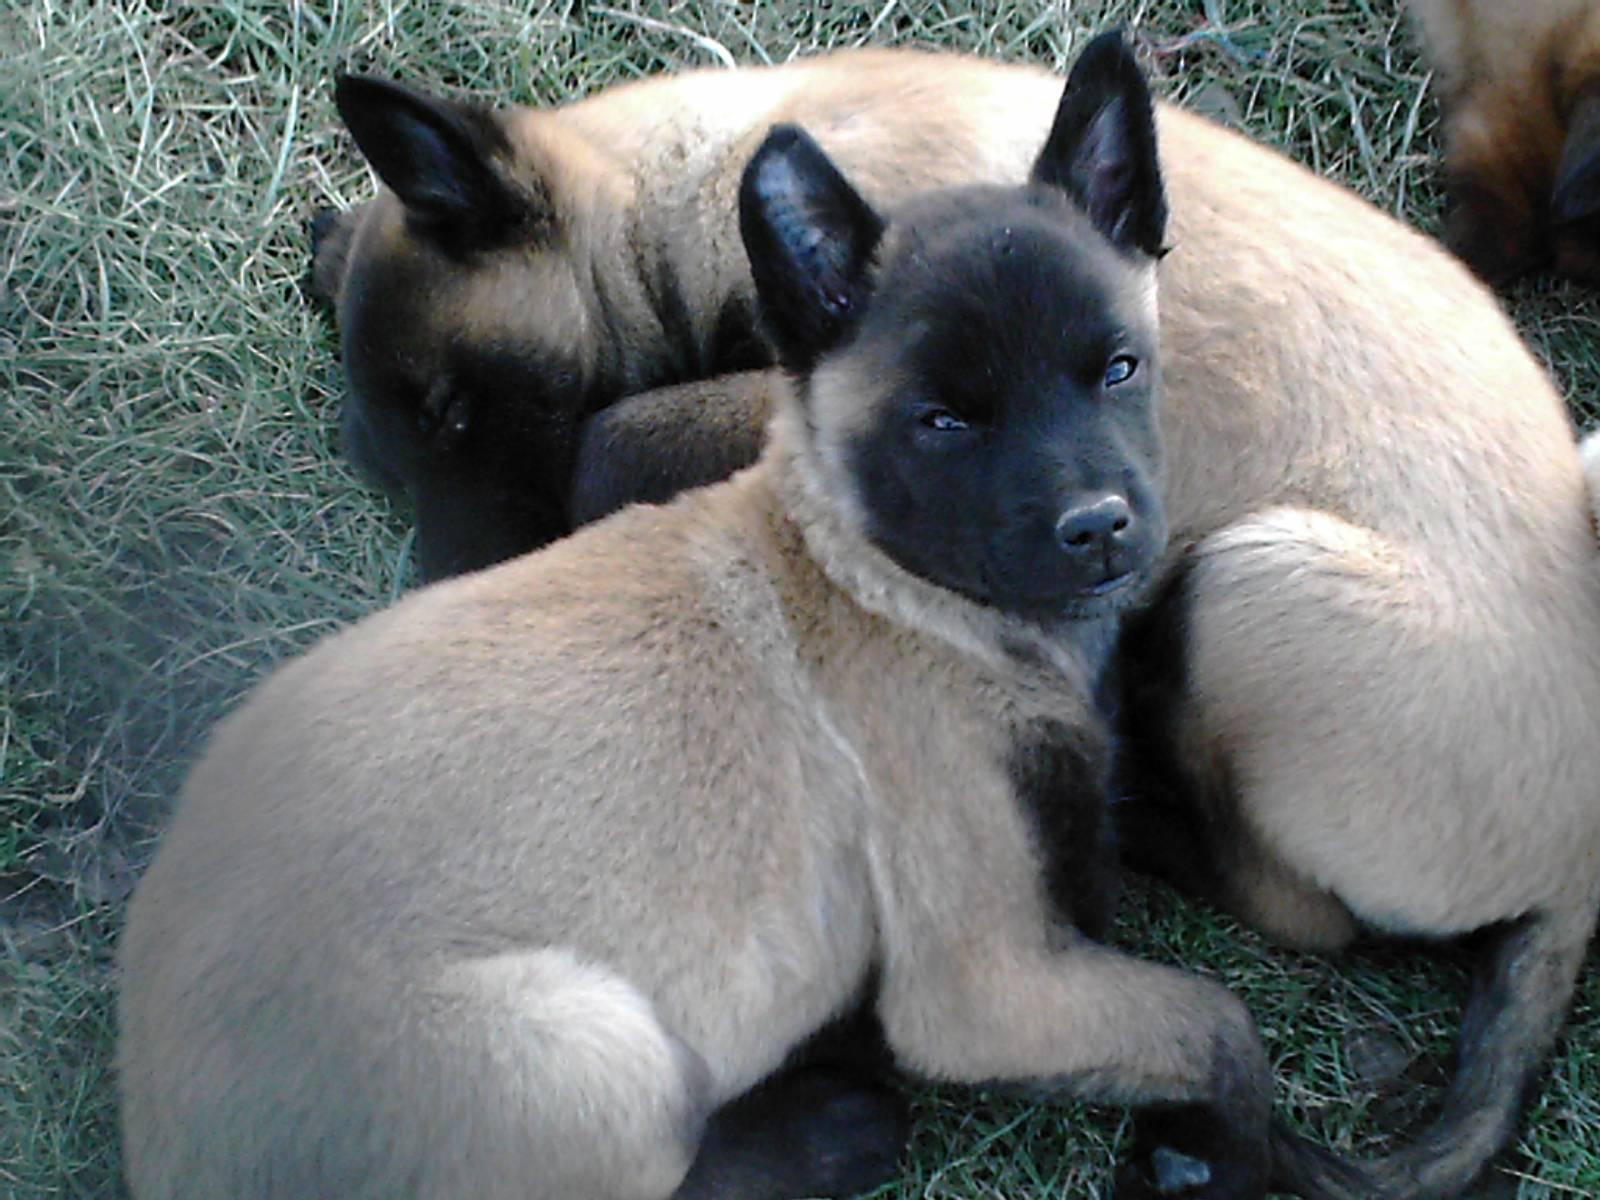 Achat de chien berger belge malinois male ou femelle